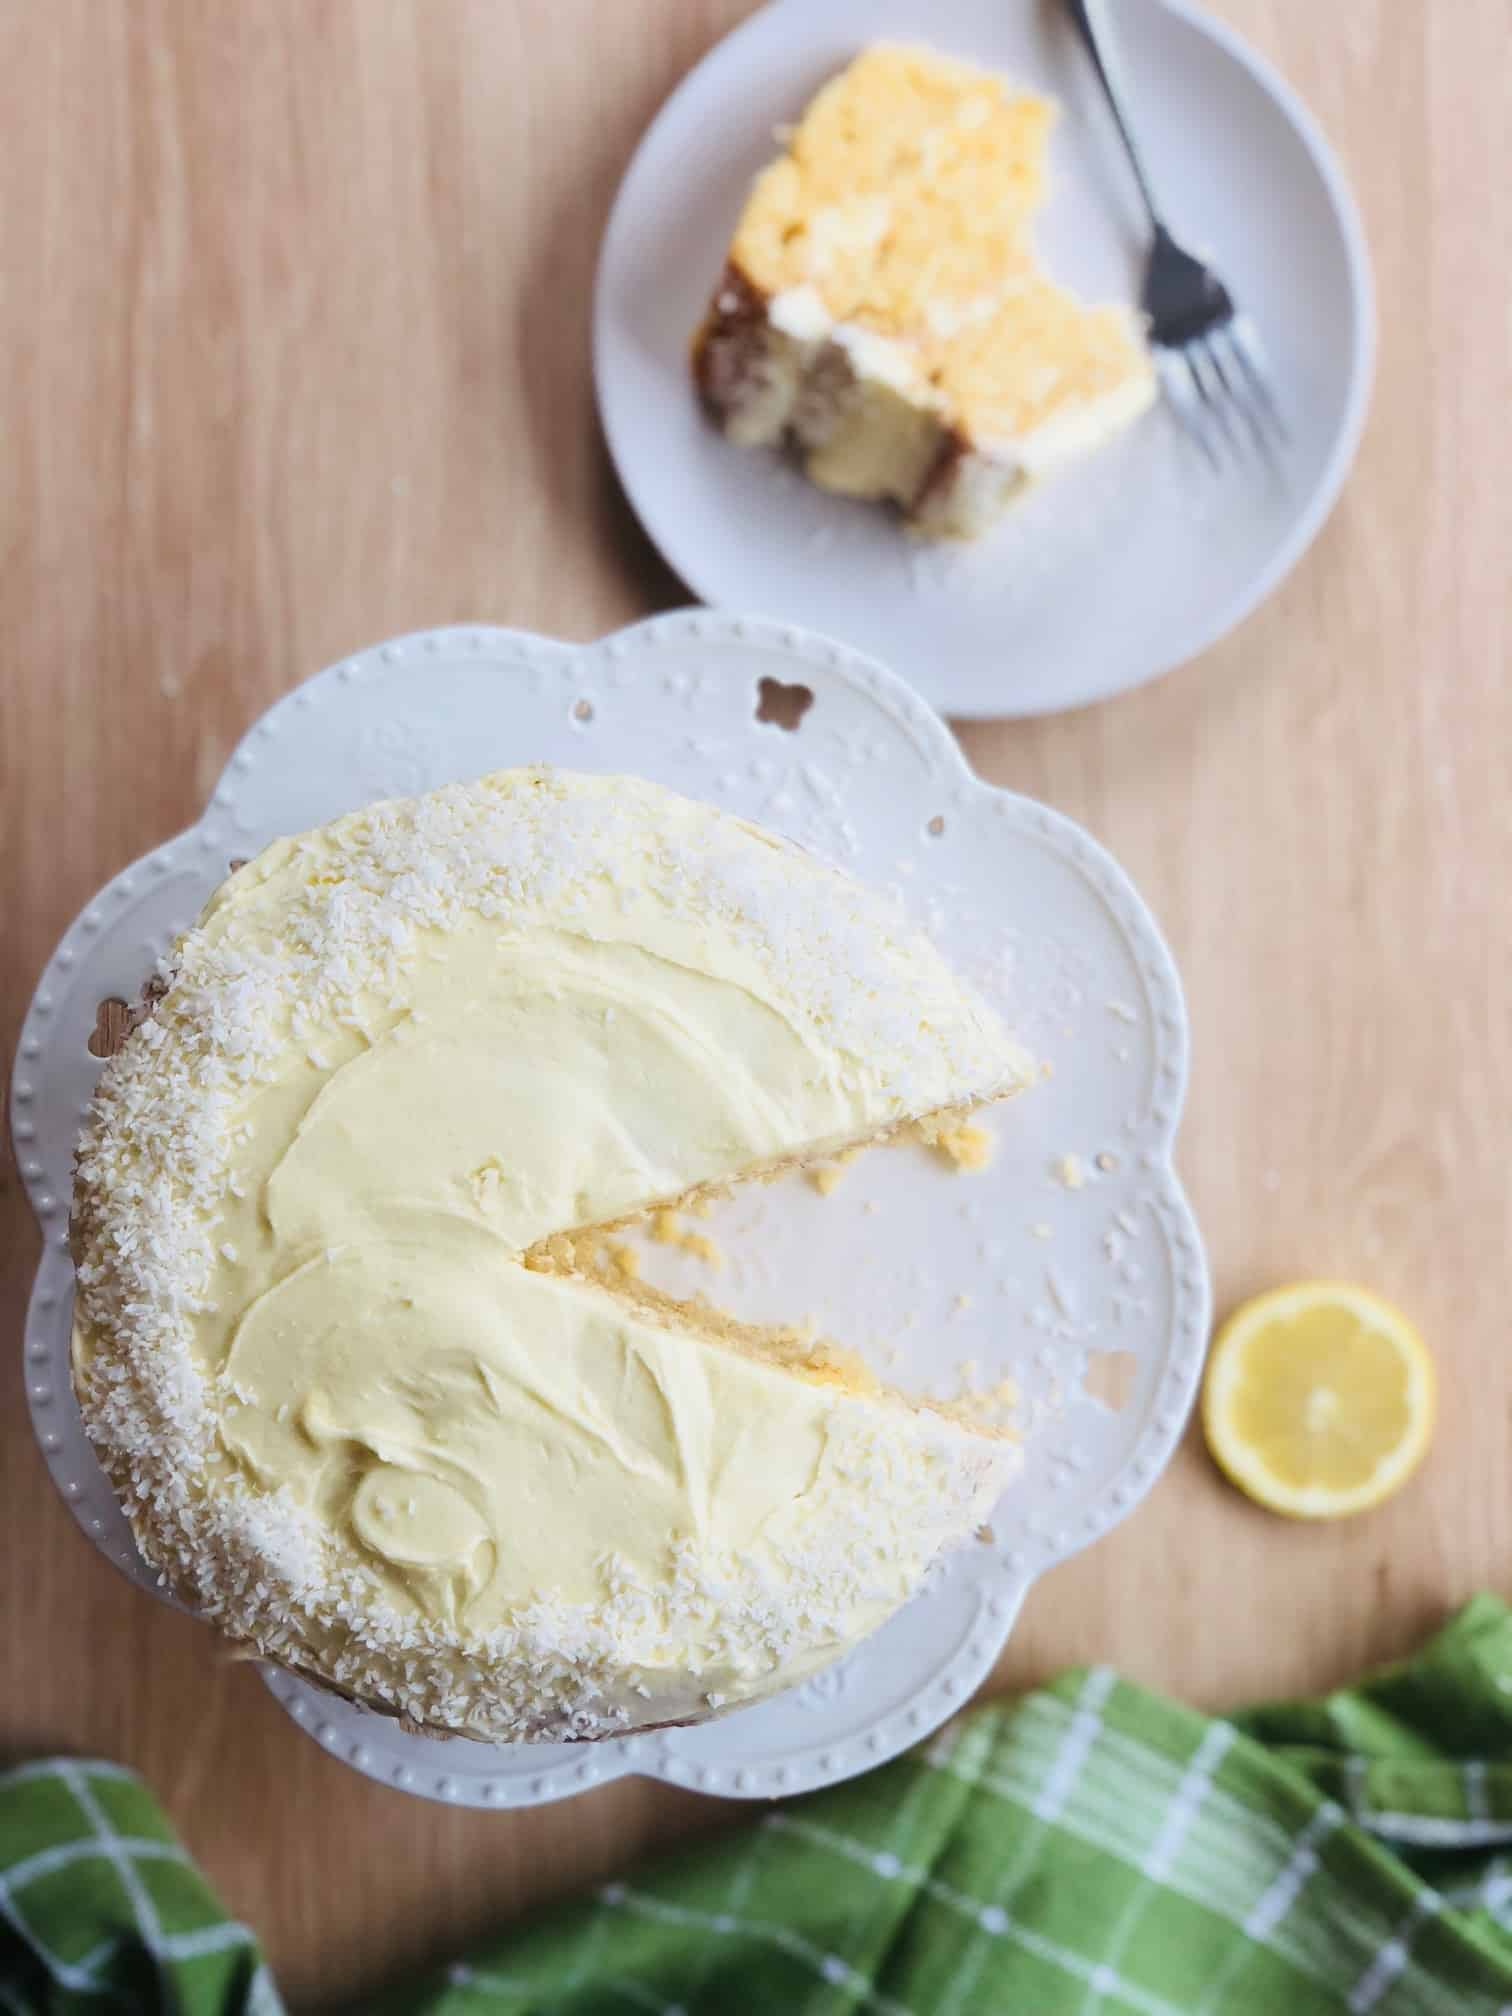 Lemon and coconut layer cake